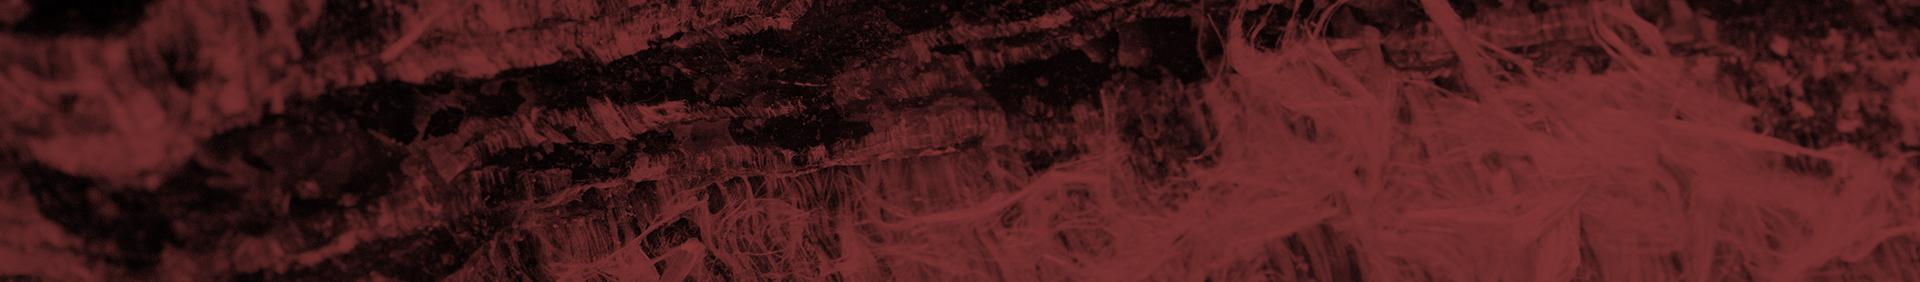 asbestos-red